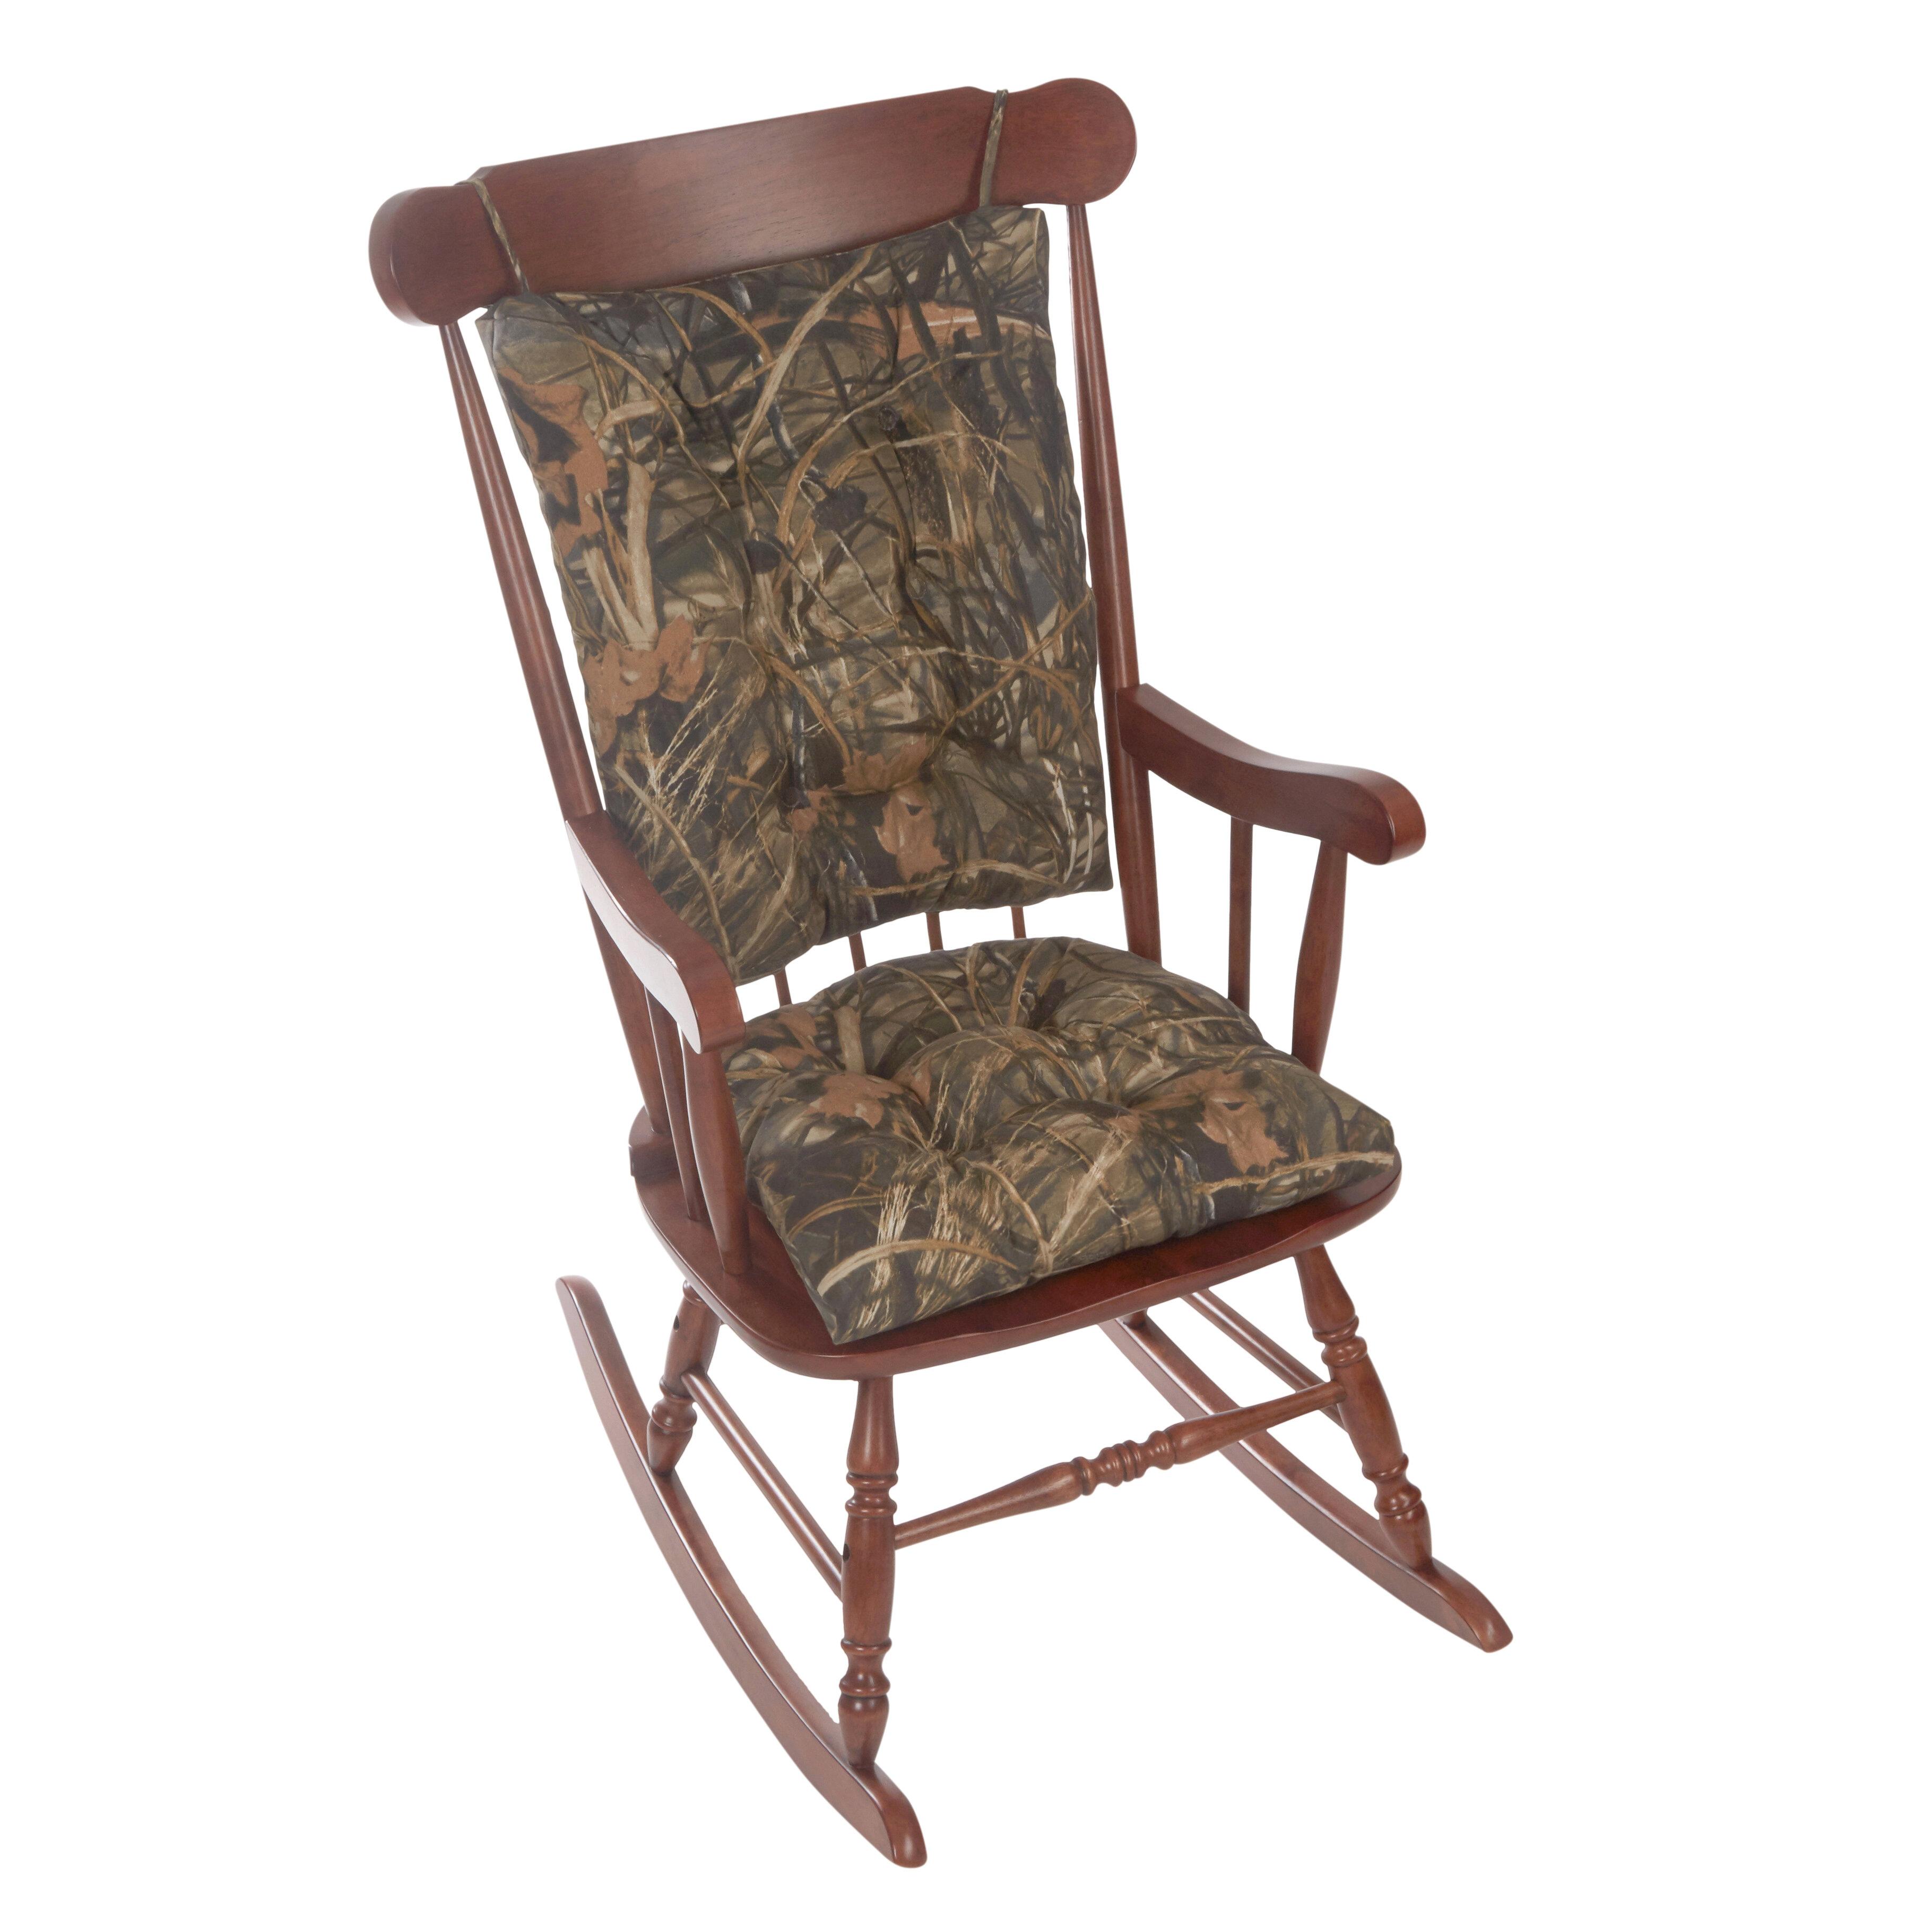 Gripper Realtree Jumbo Indoor Outdoor Rocking Chair Cushion